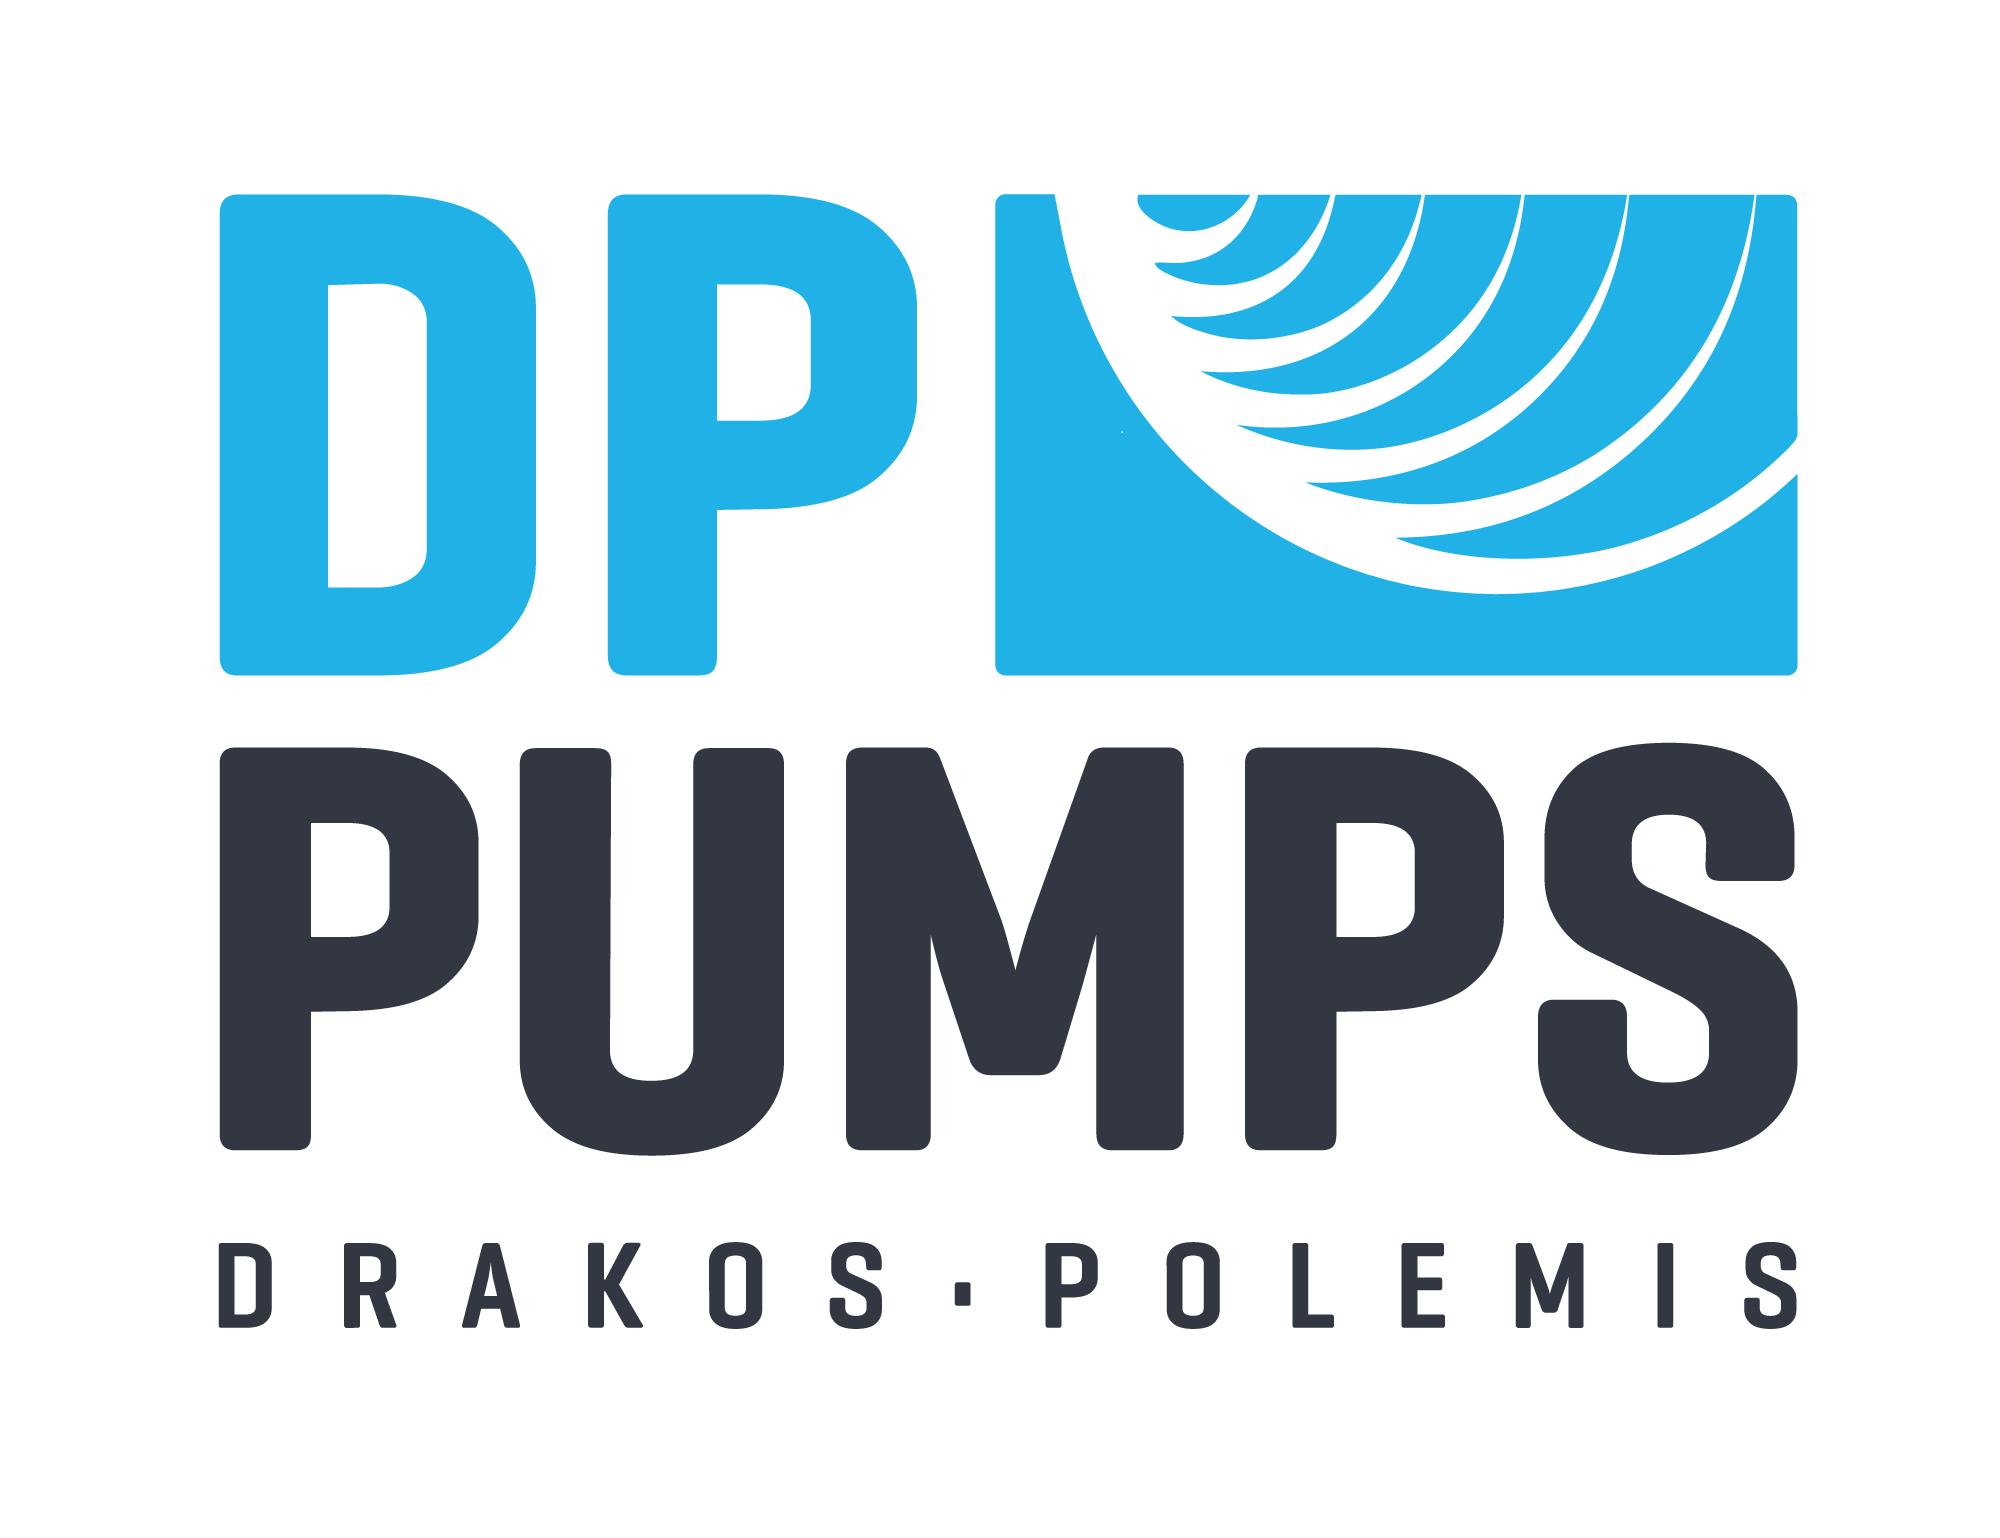 Drakos-Polemis DP PUMPS